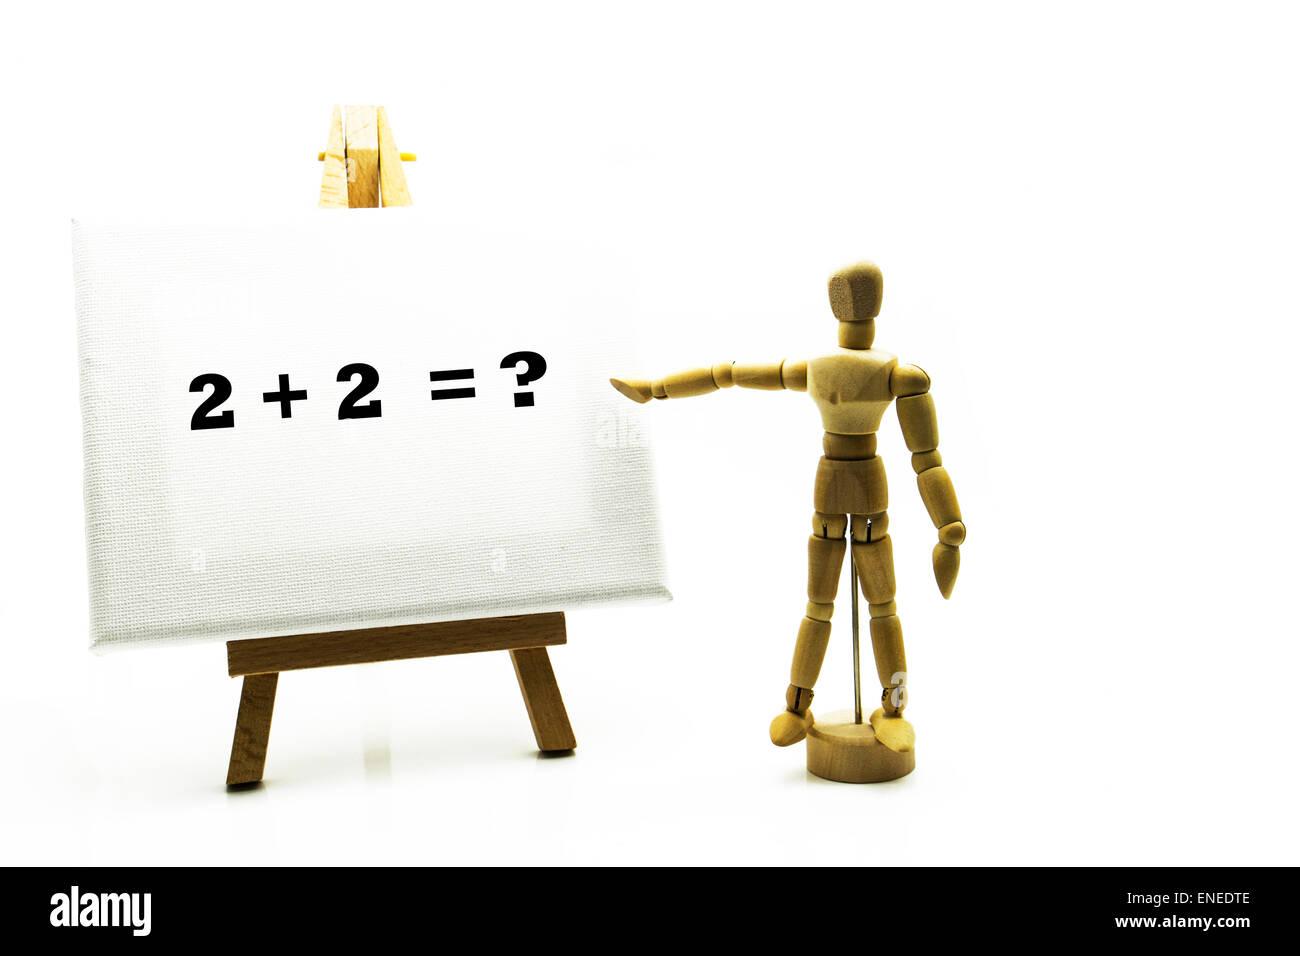 "Hombre de madera con tablero blanco apuntando a las palabras ""2 + 2 = ?' suma sumas educación concepto Imagen De Stock"